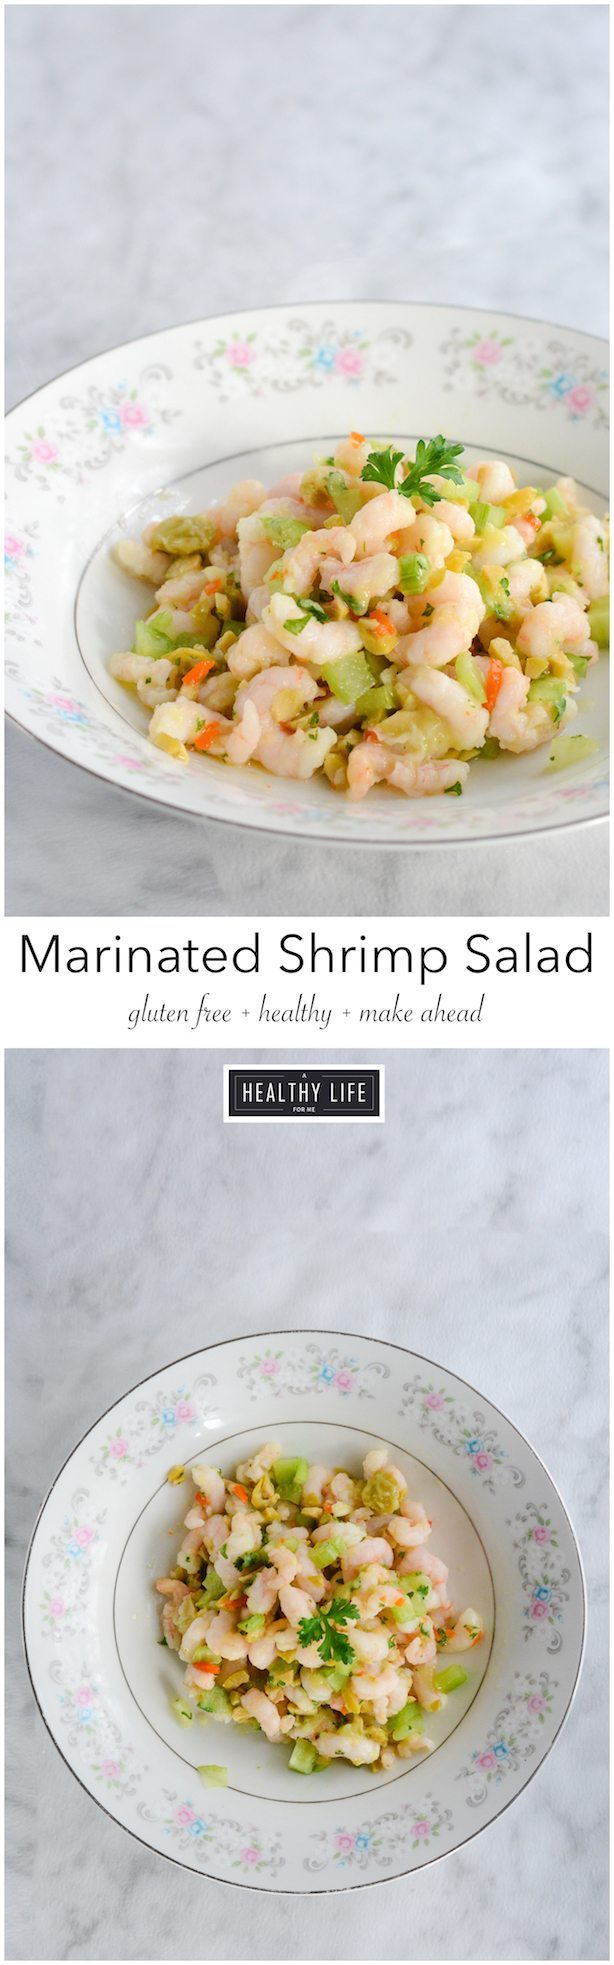 Marinated Shrimp Salad is easy make ahead healthy gluten free and paleo recipe   ahealthylifeforme.com